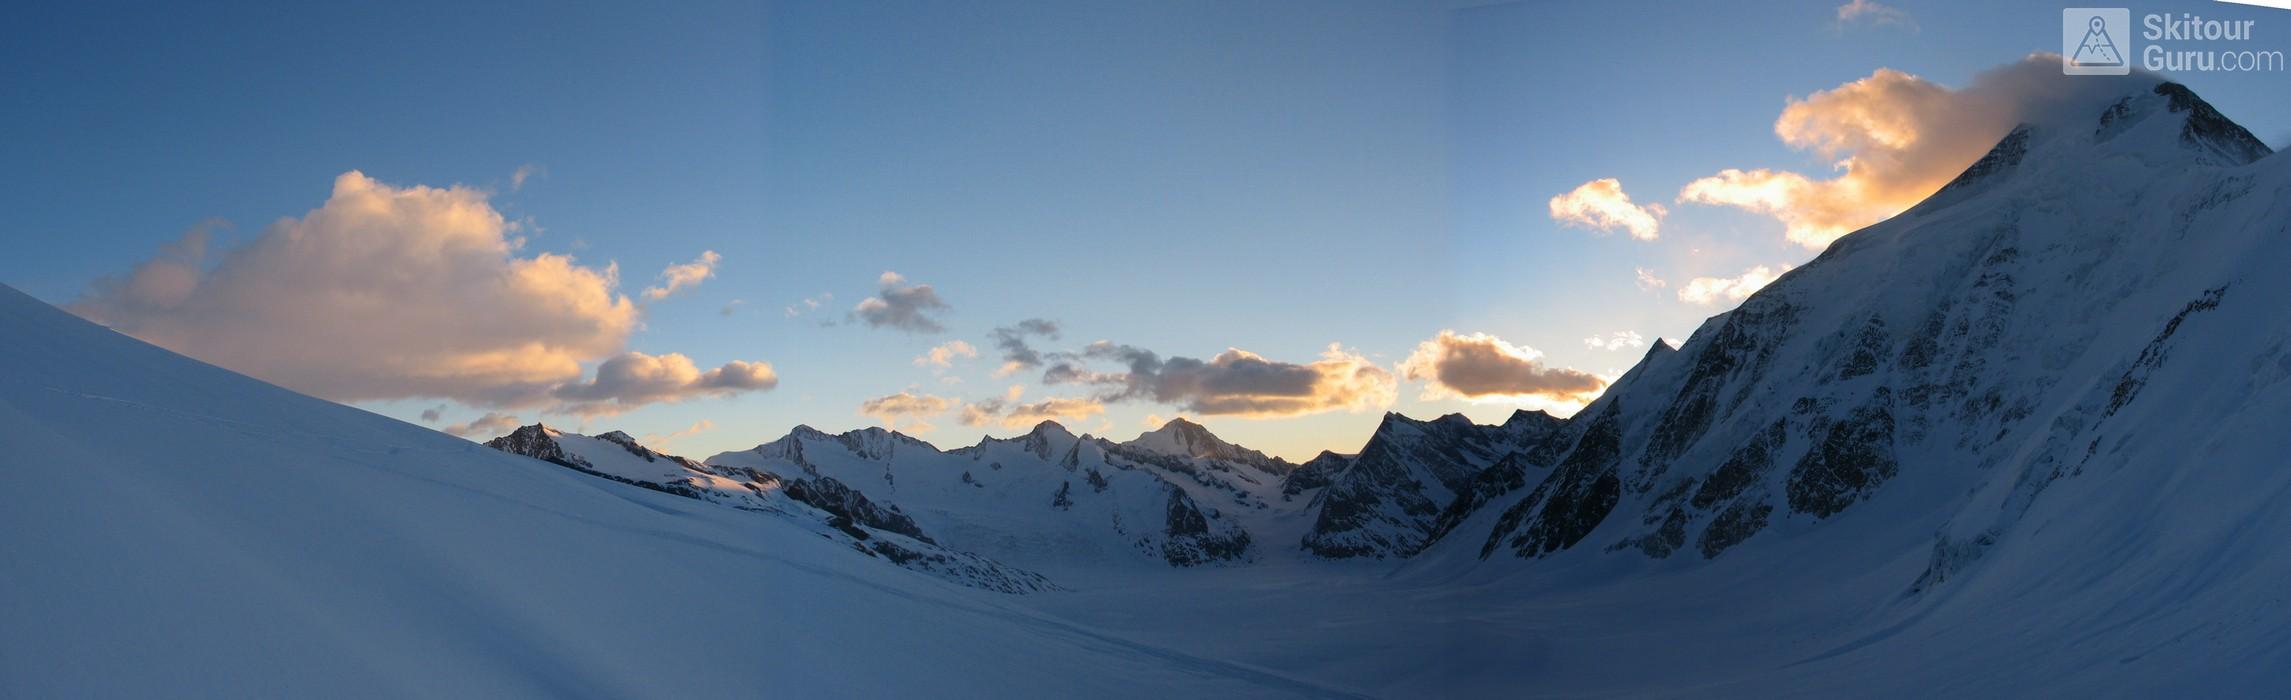 Hollandiahütte (Lötschenhütte) Berner Alpen / Alpes bernoises Switzerland panorama 12